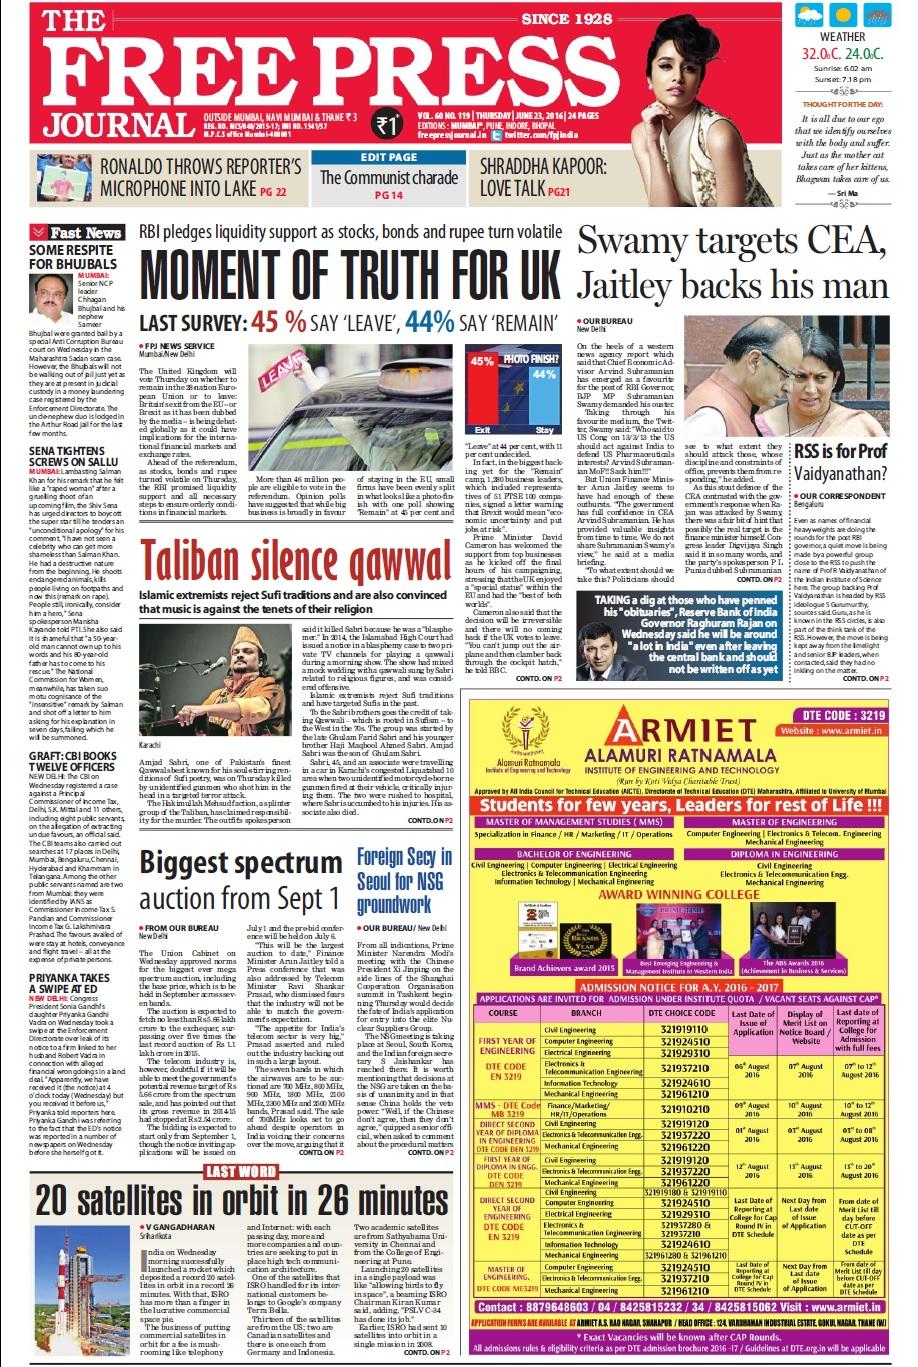 The Free Press Journal Newspaper Advertising